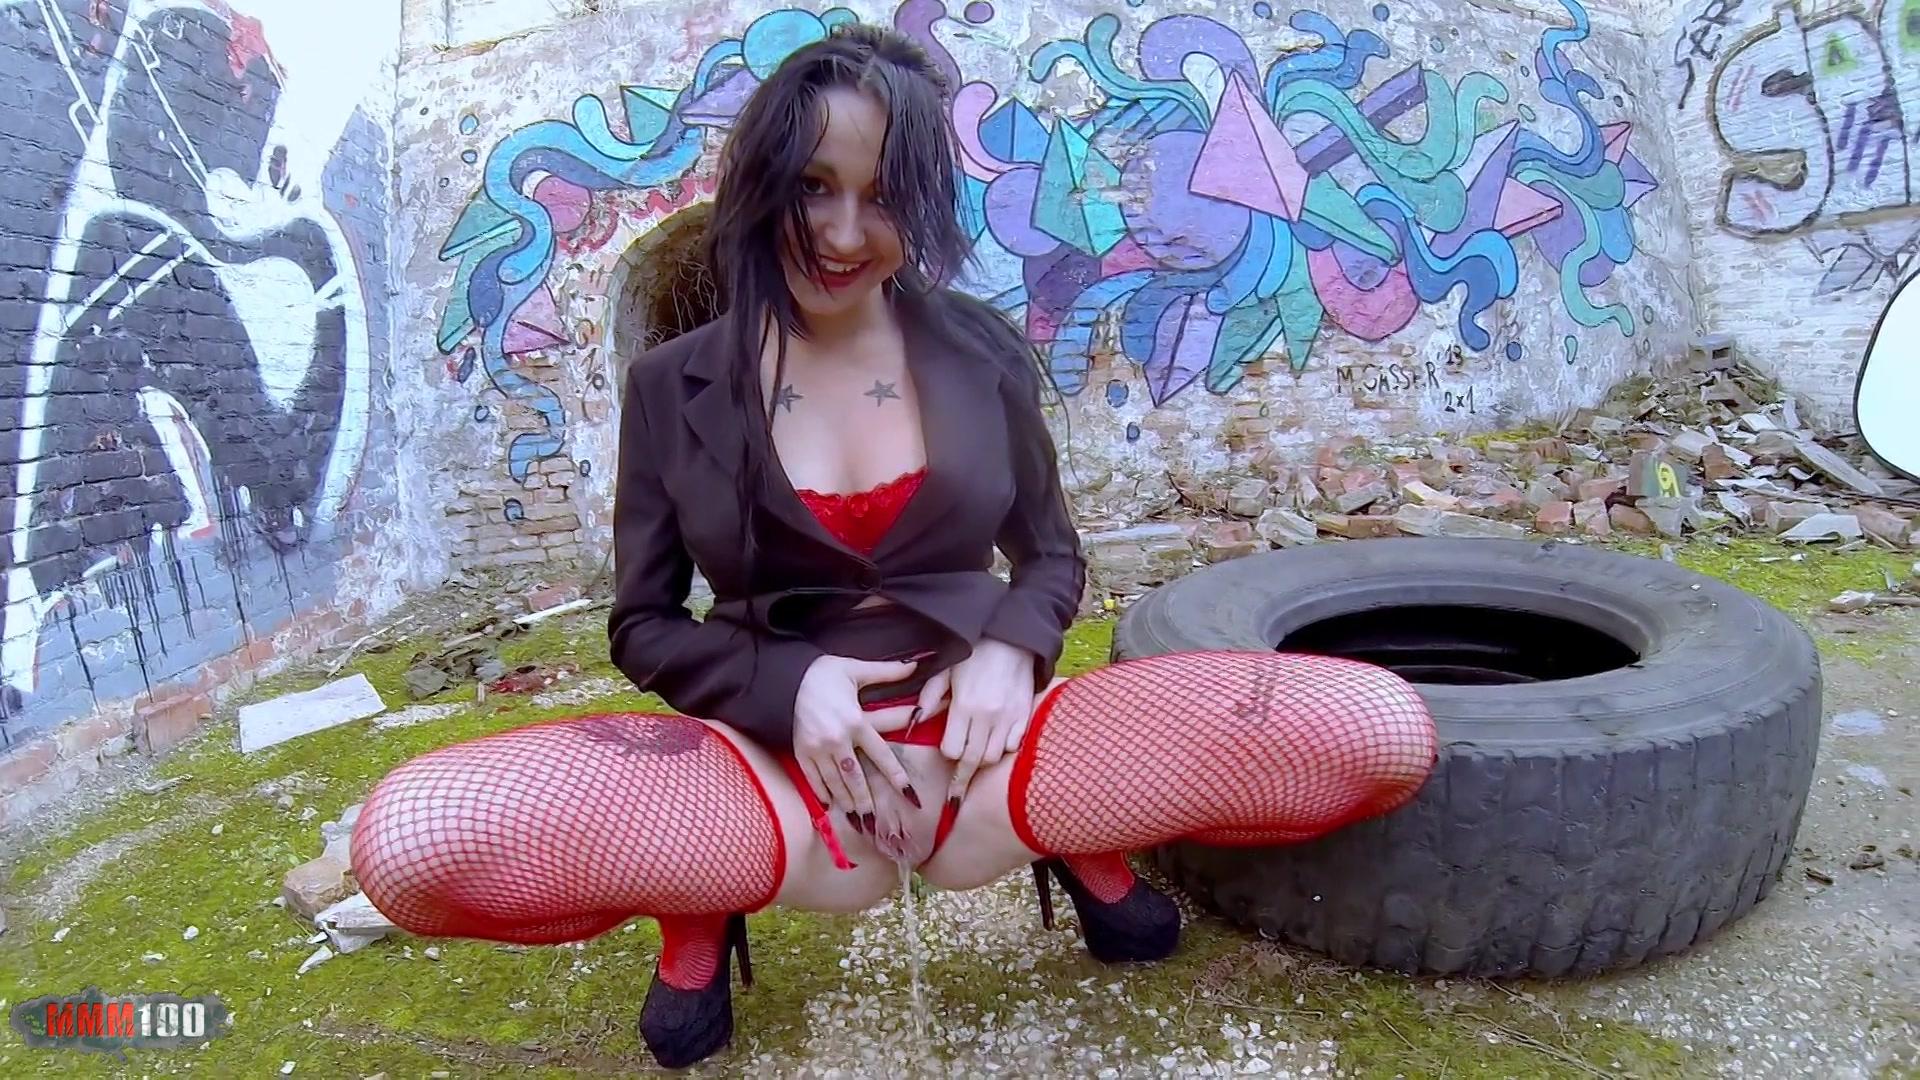 foto sexo vieja latina gratis: